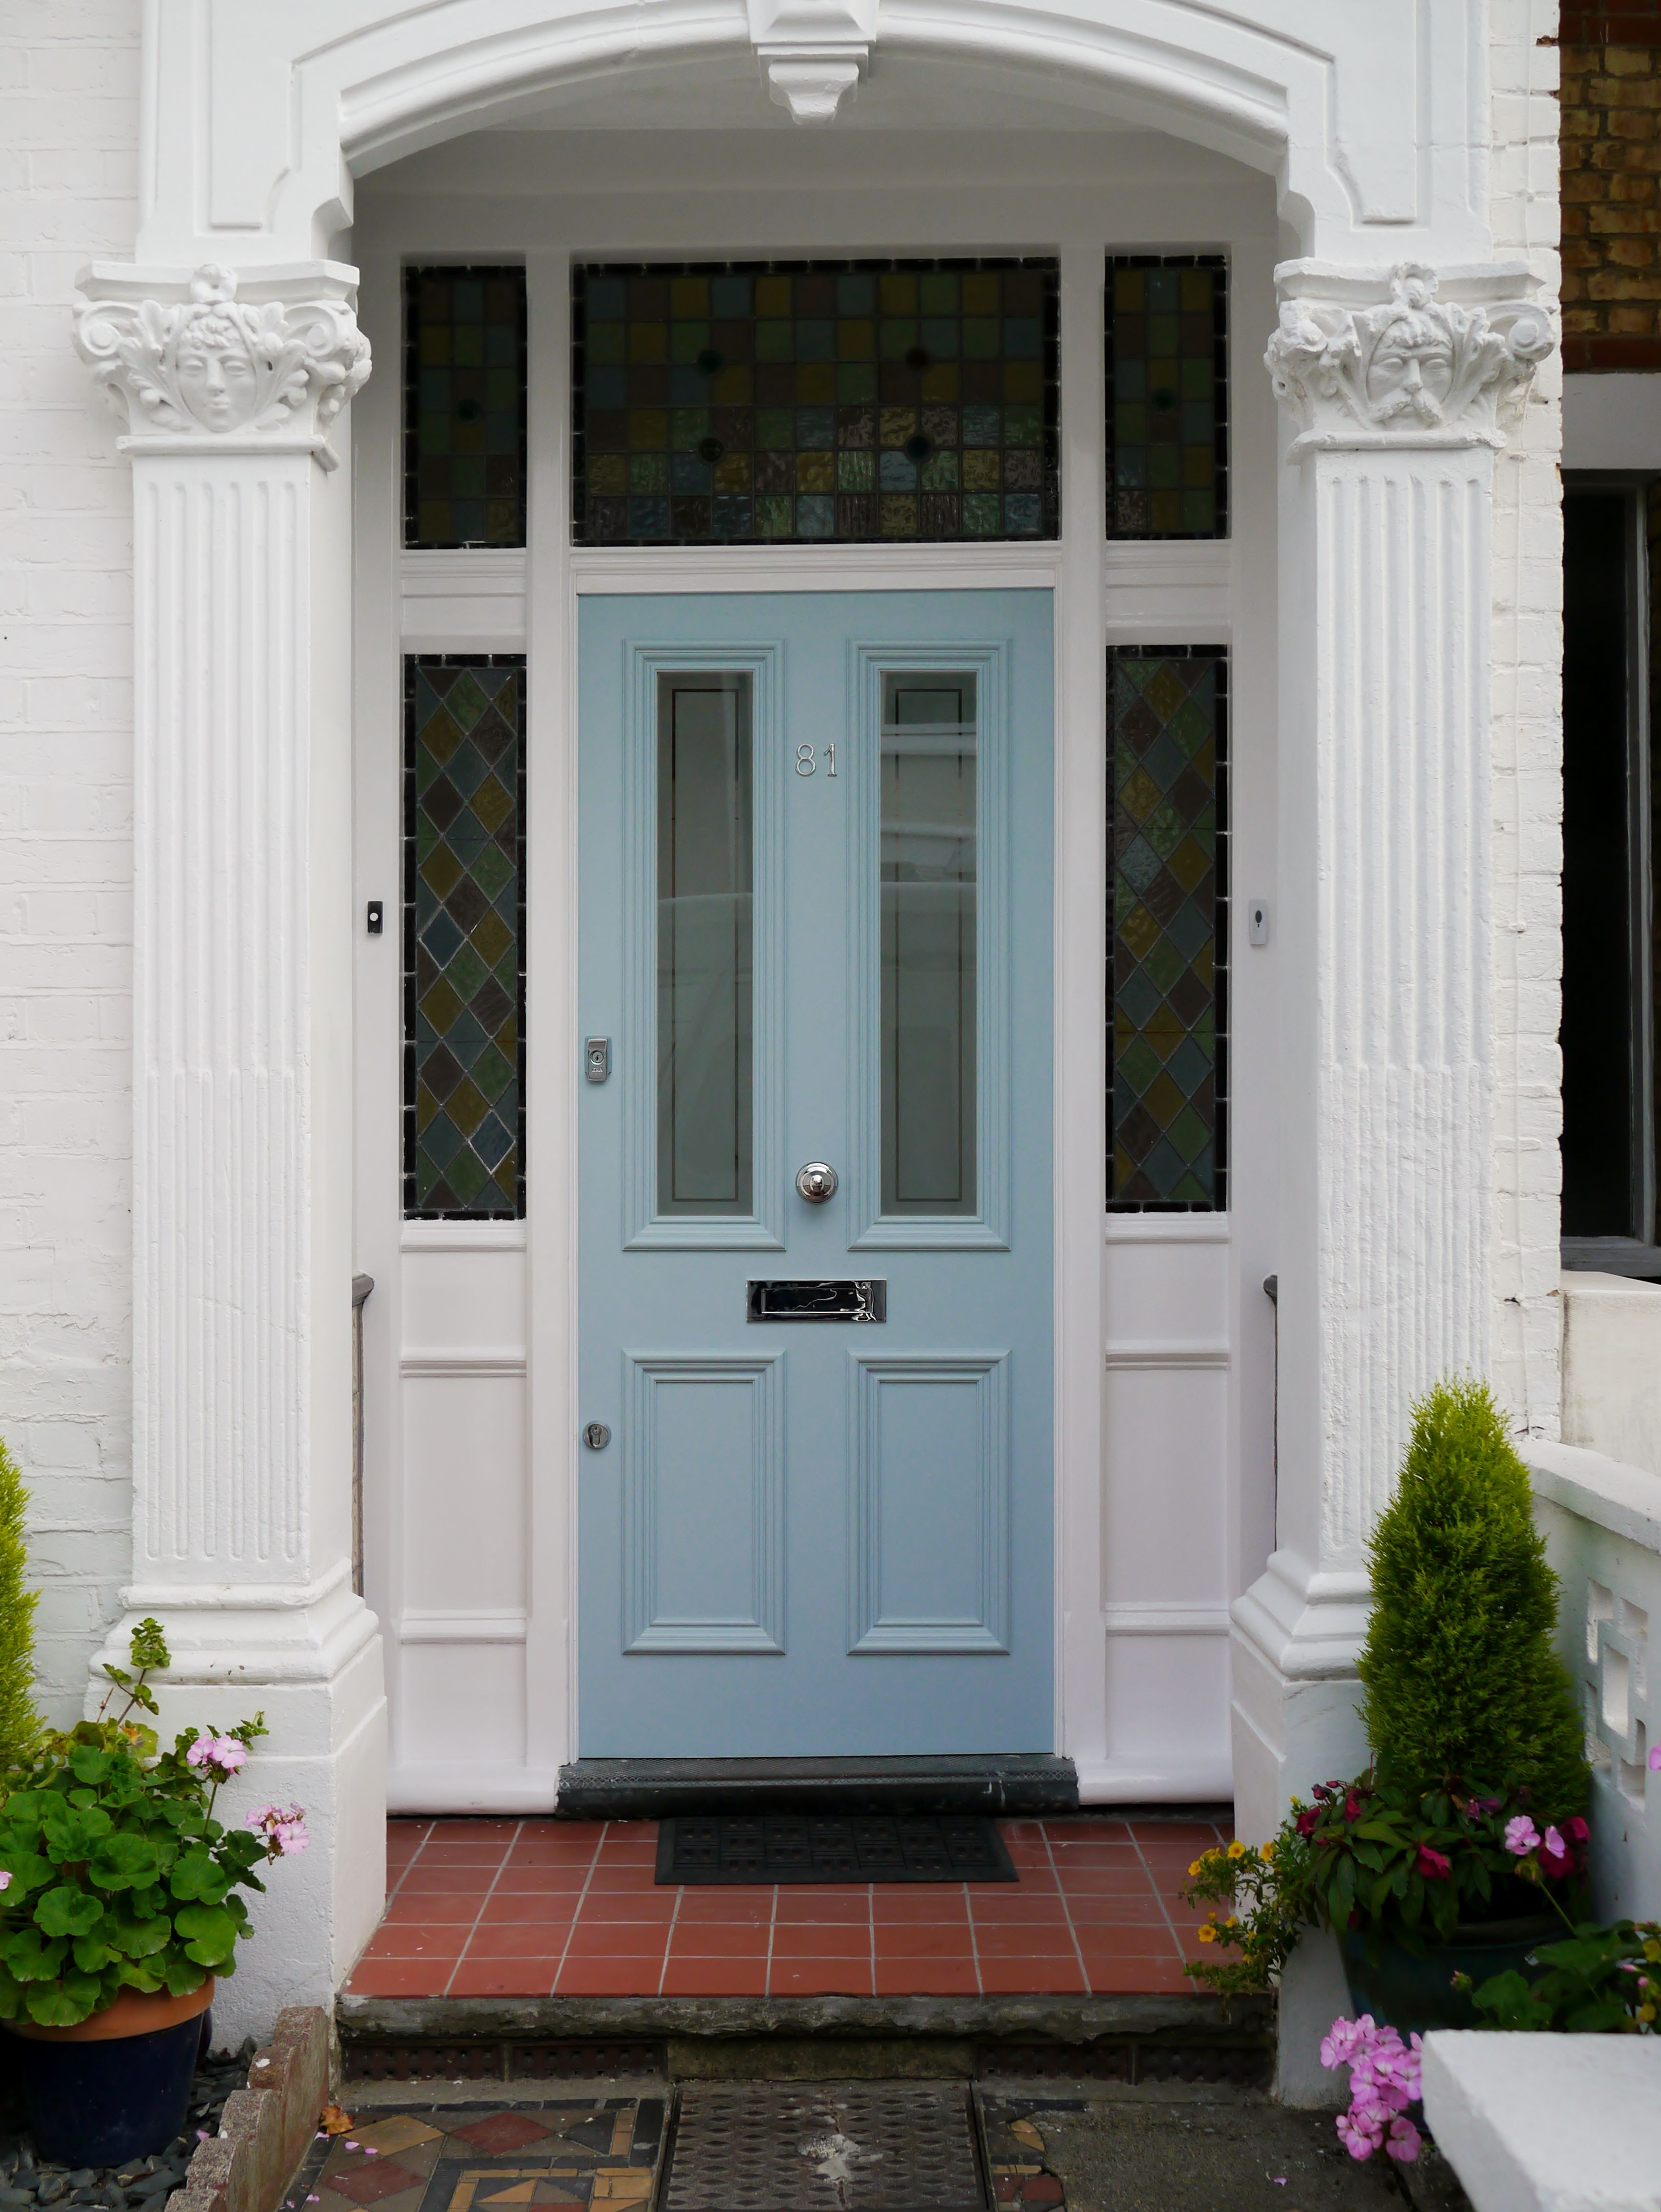 The london door company wandsworth london farrow and - Farrow and ball exterior door paint ...